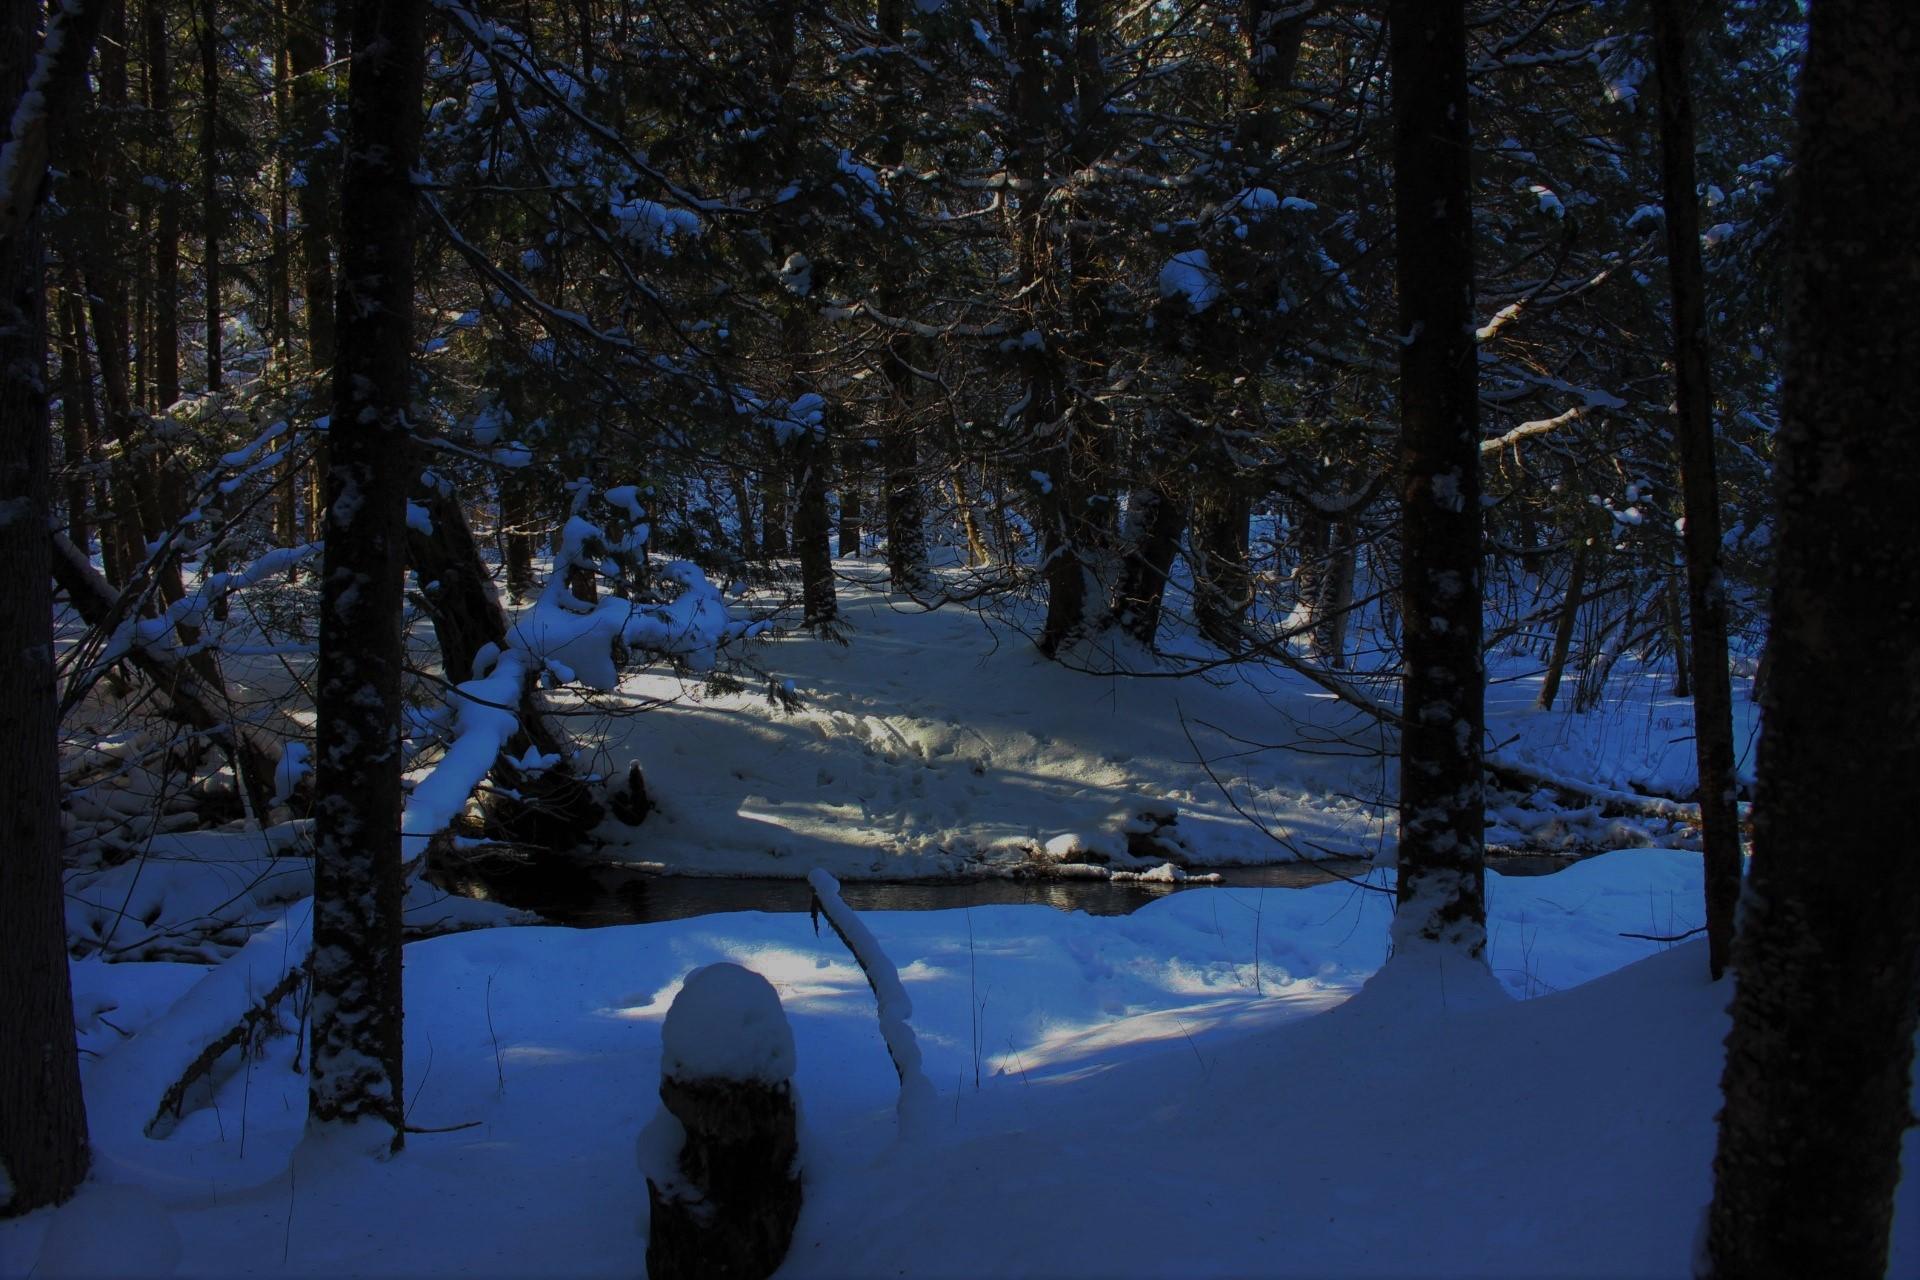 Snowy Trails Dark 2 - MARSH BY MOONLIGHT SNOWSHOE